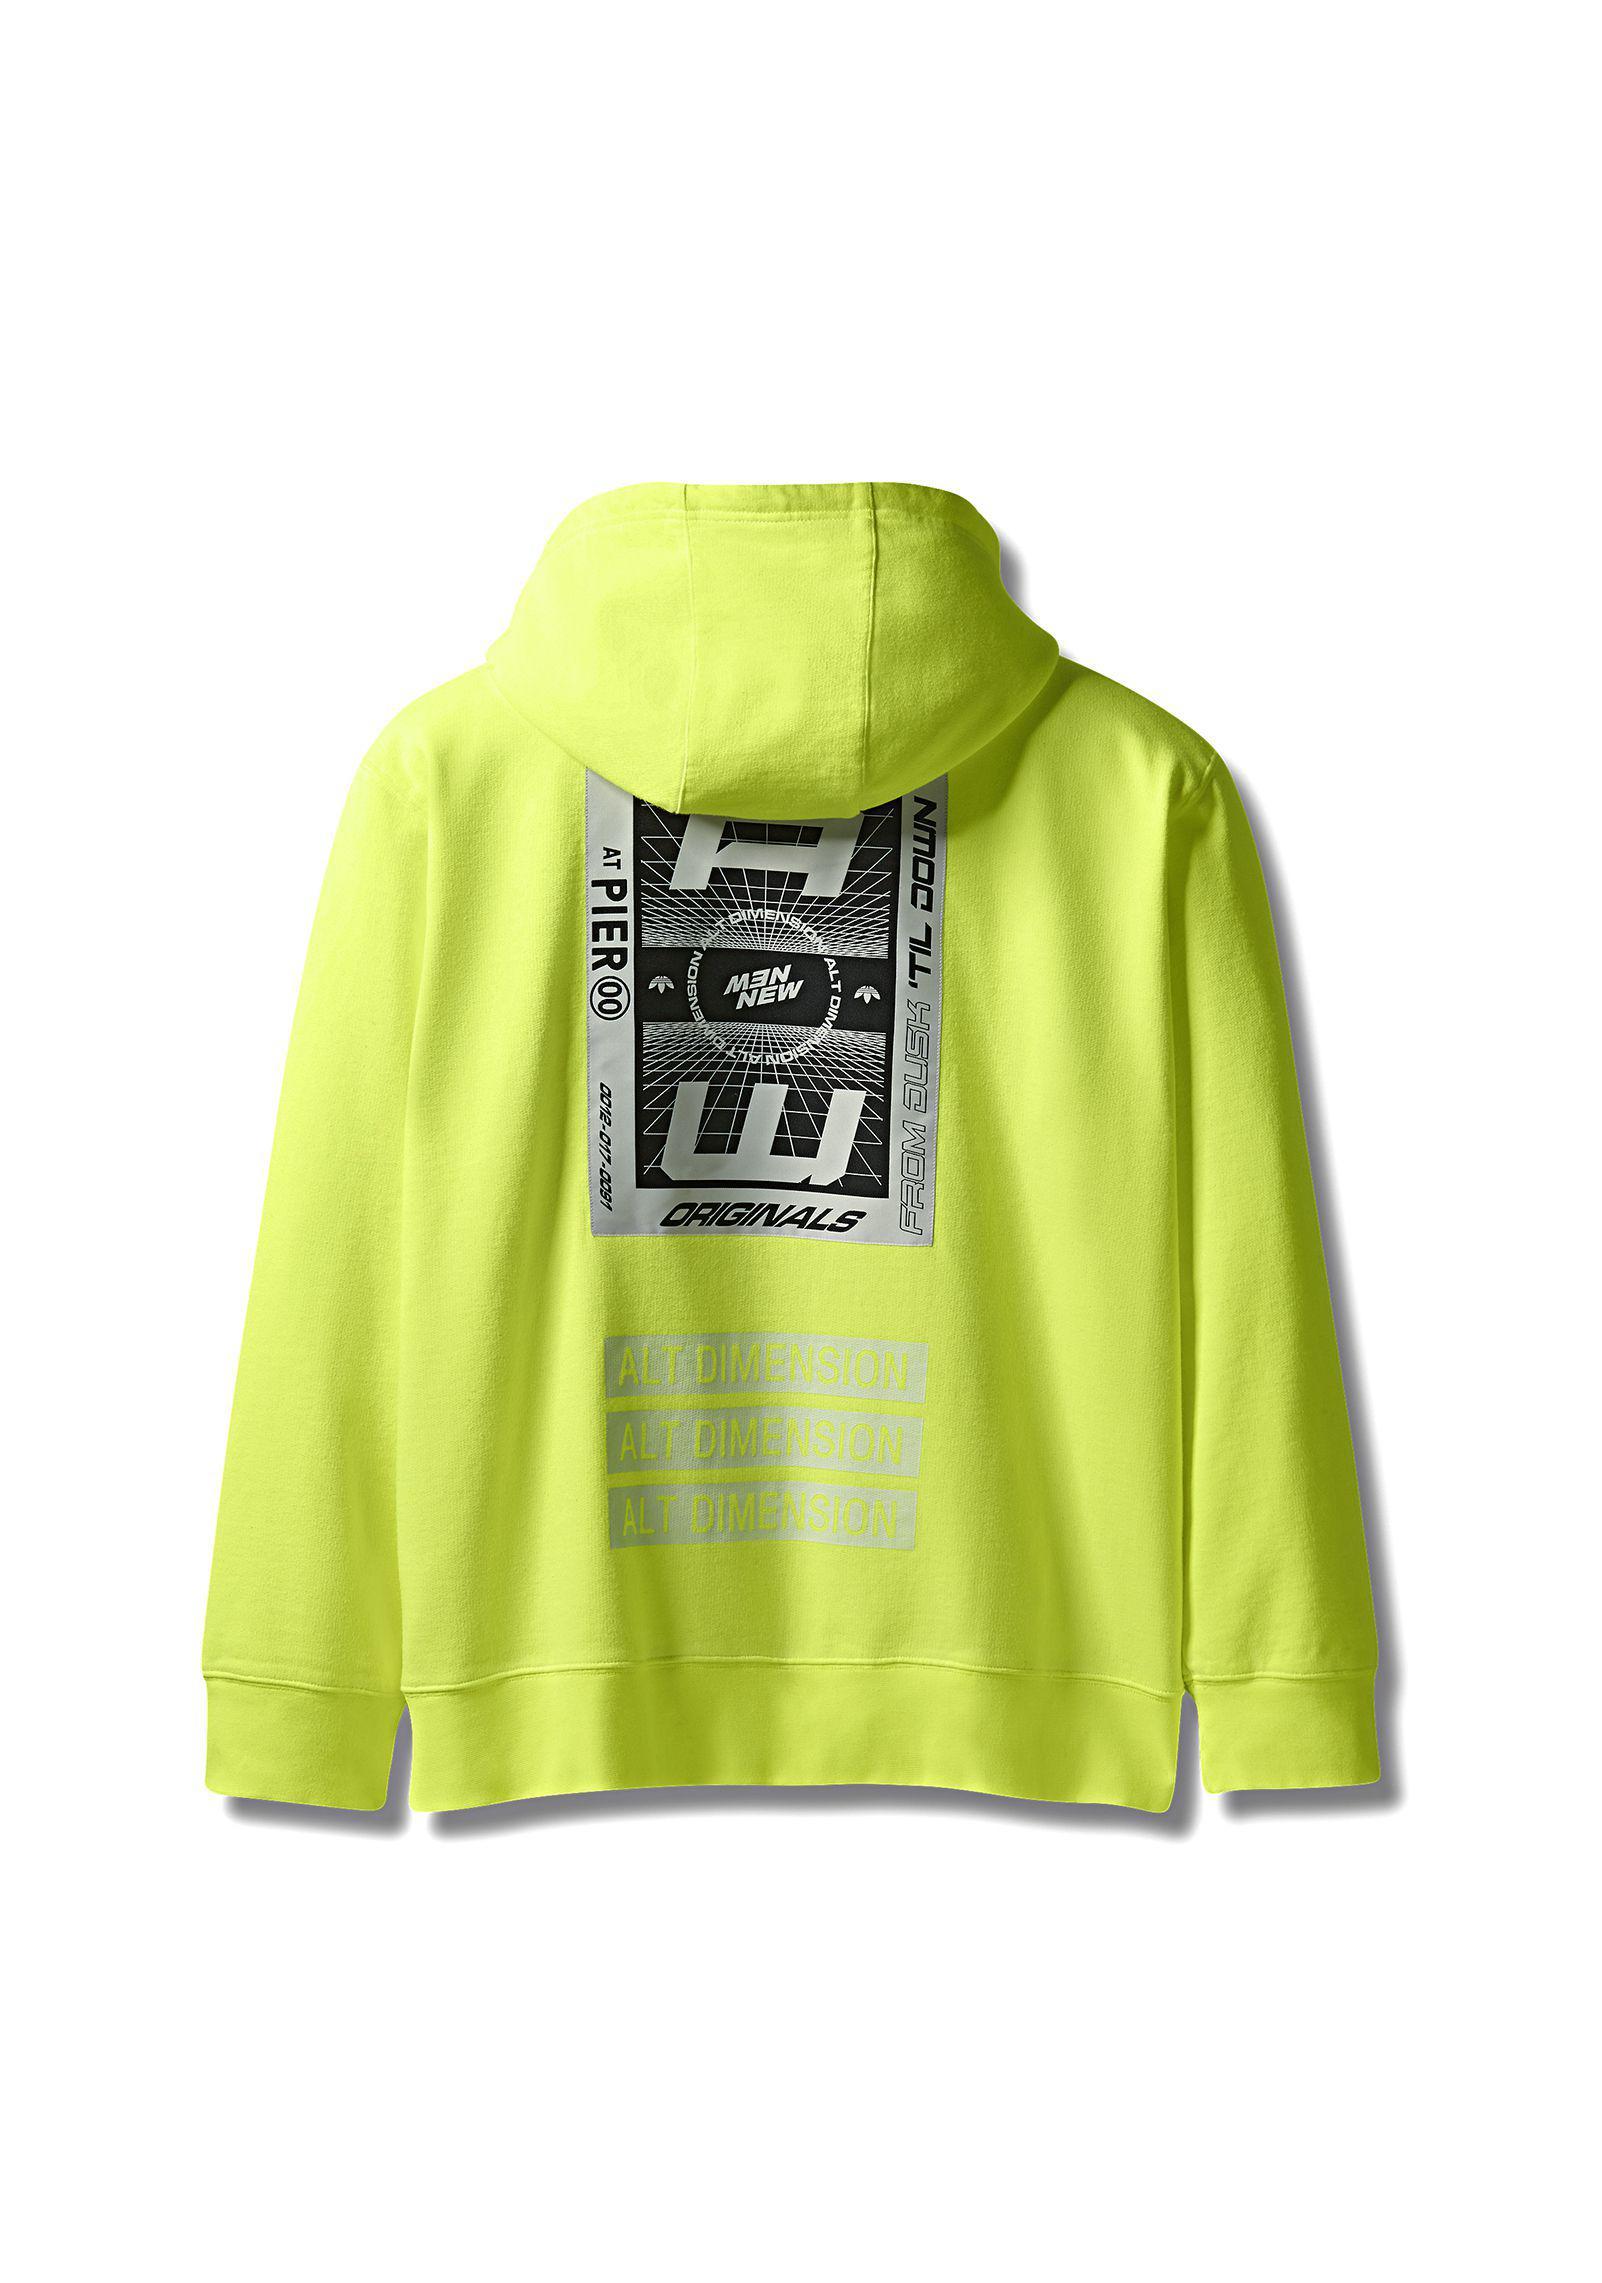 Alexander Wang Adidas Originals By Aw Bleach Hoodie in Yellow - Lyst 1c450cd66969e